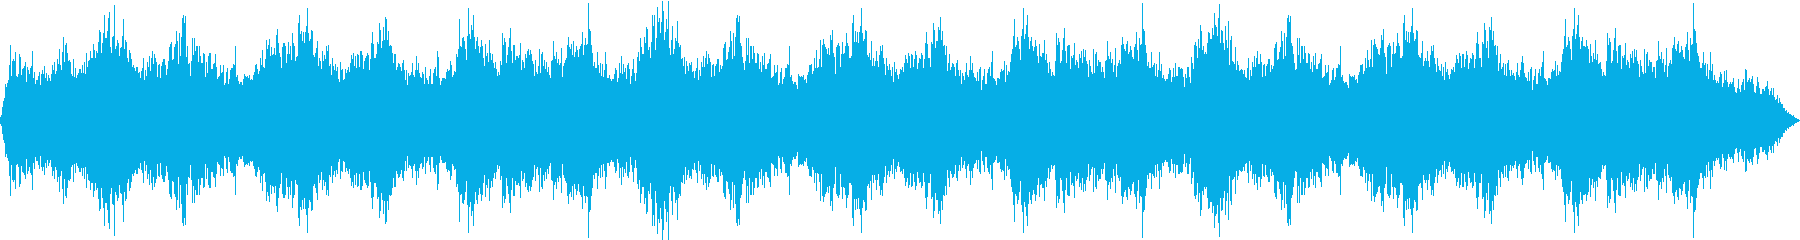 魔法詠唱、魔法発動、独白 16の再生済みの波形